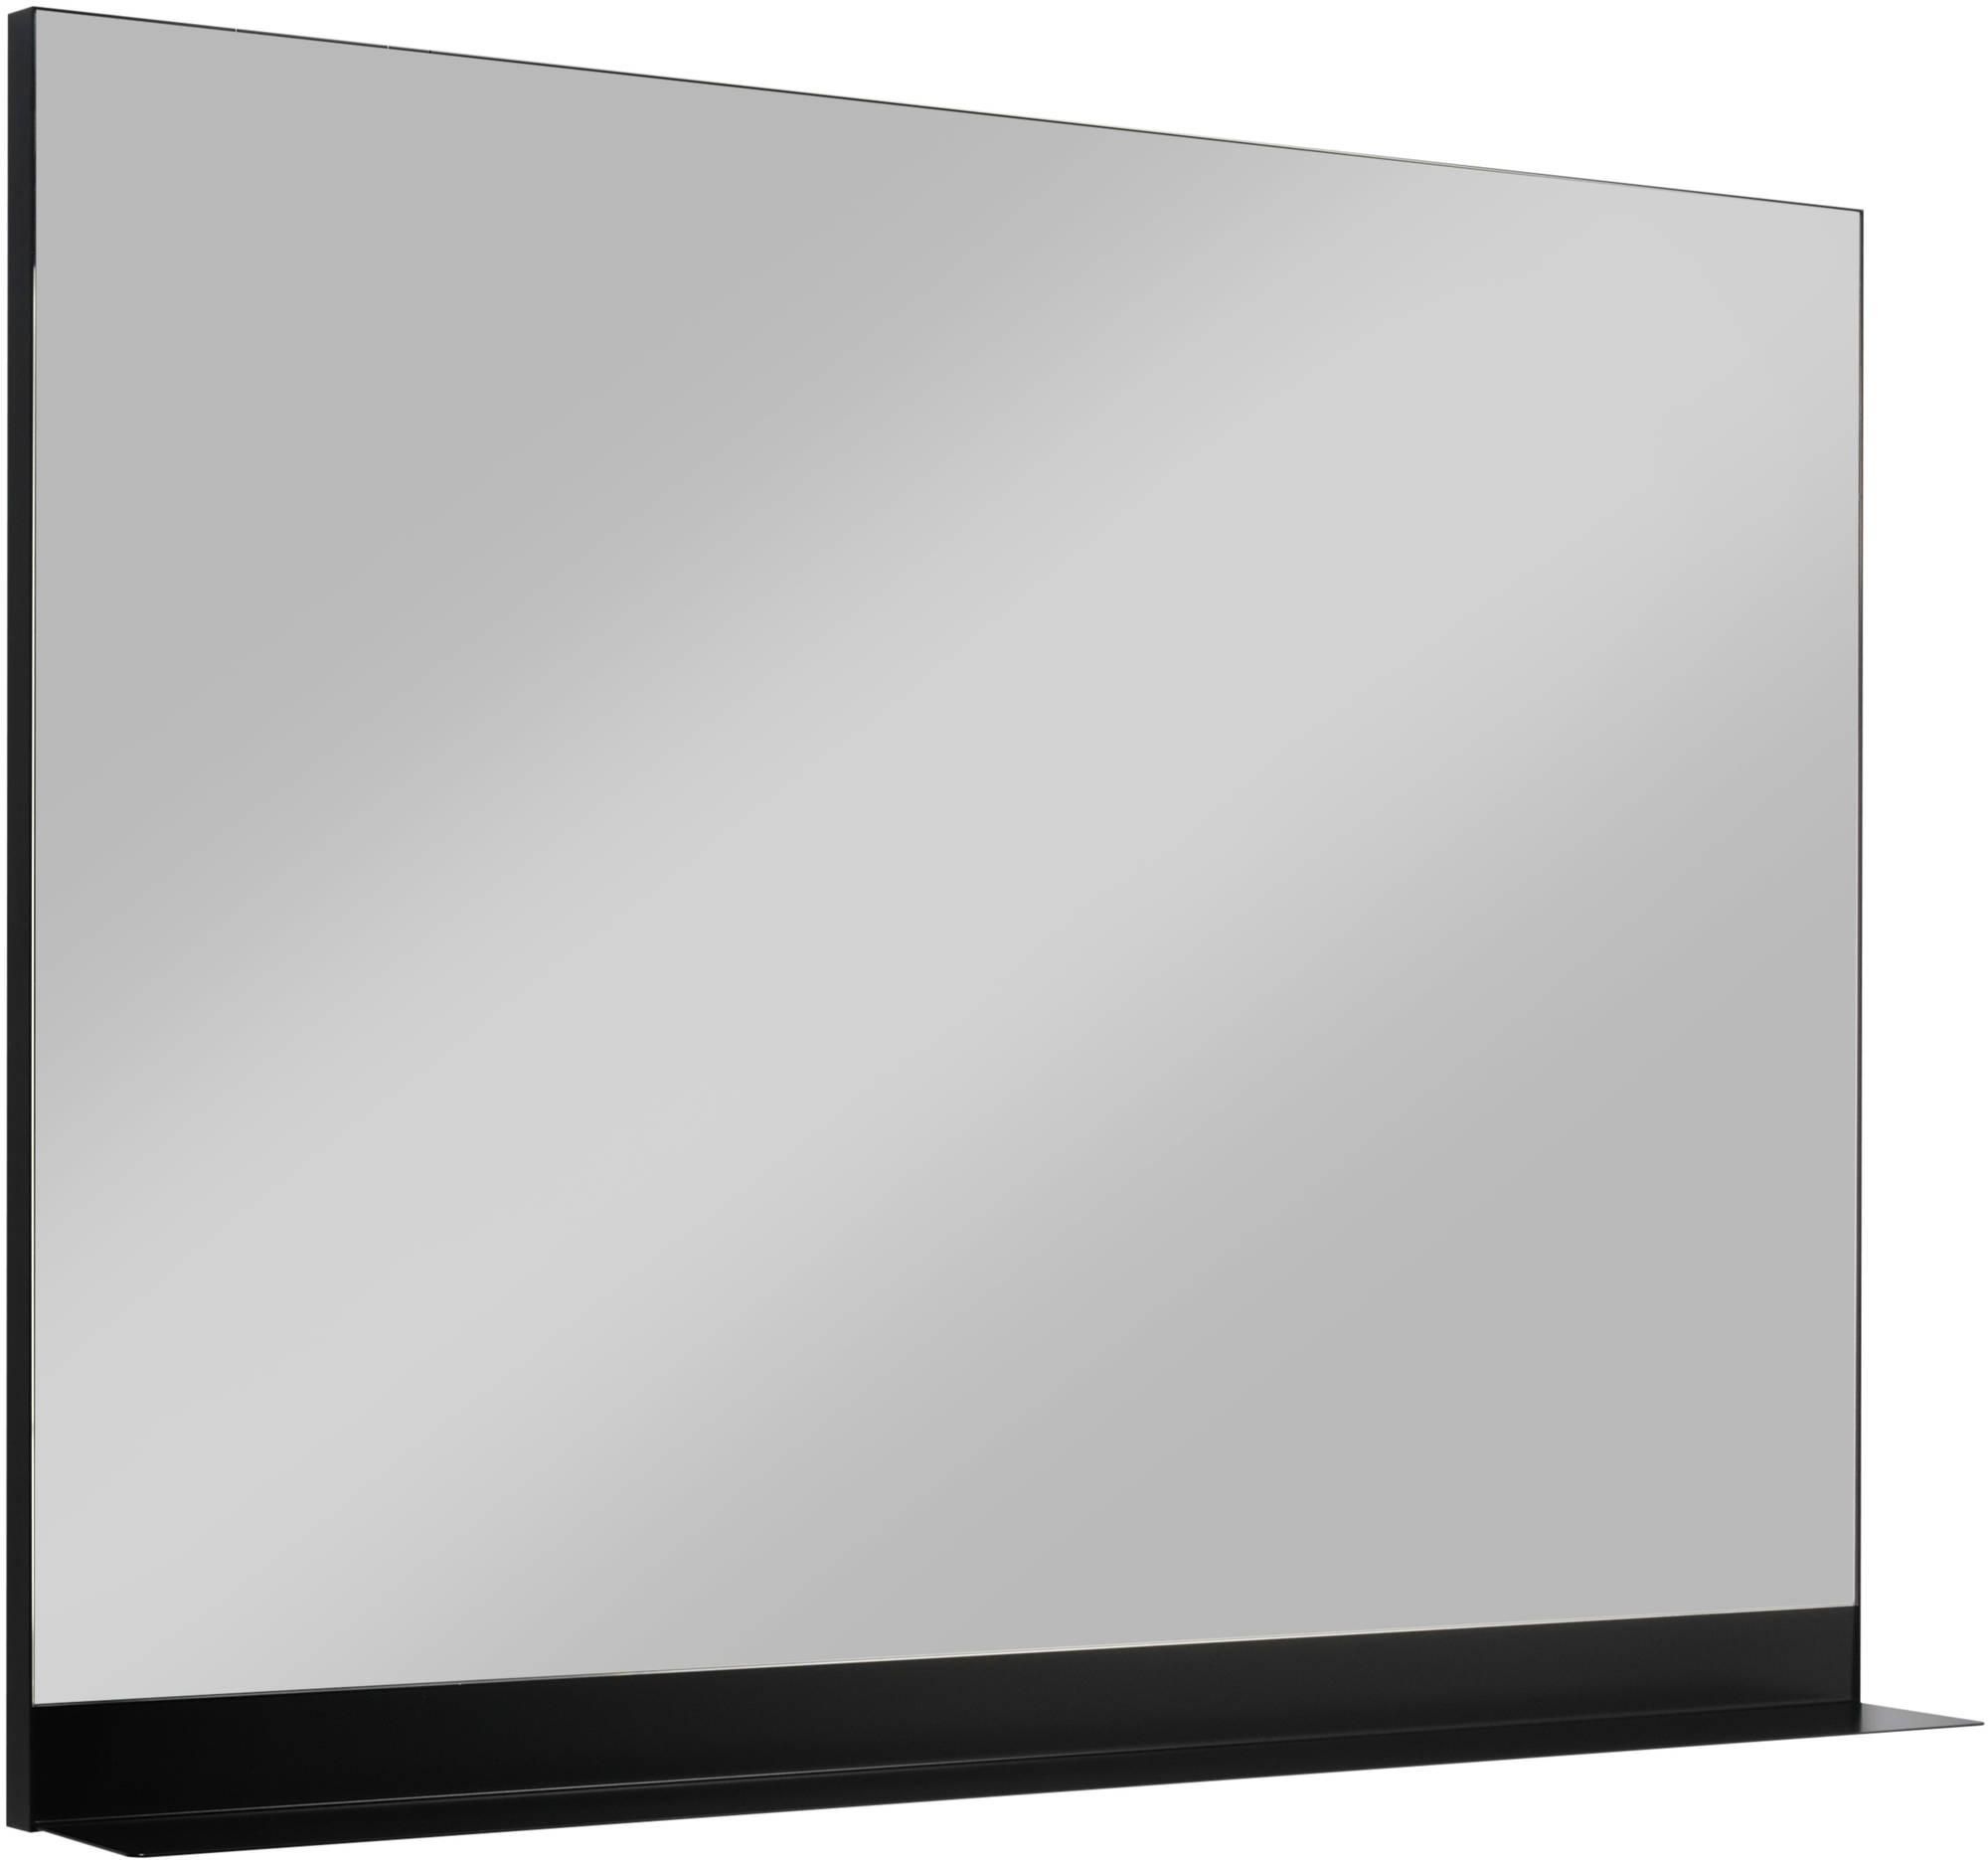 Ben Fossano spiegel met mat zwarte planchet 100x75cm